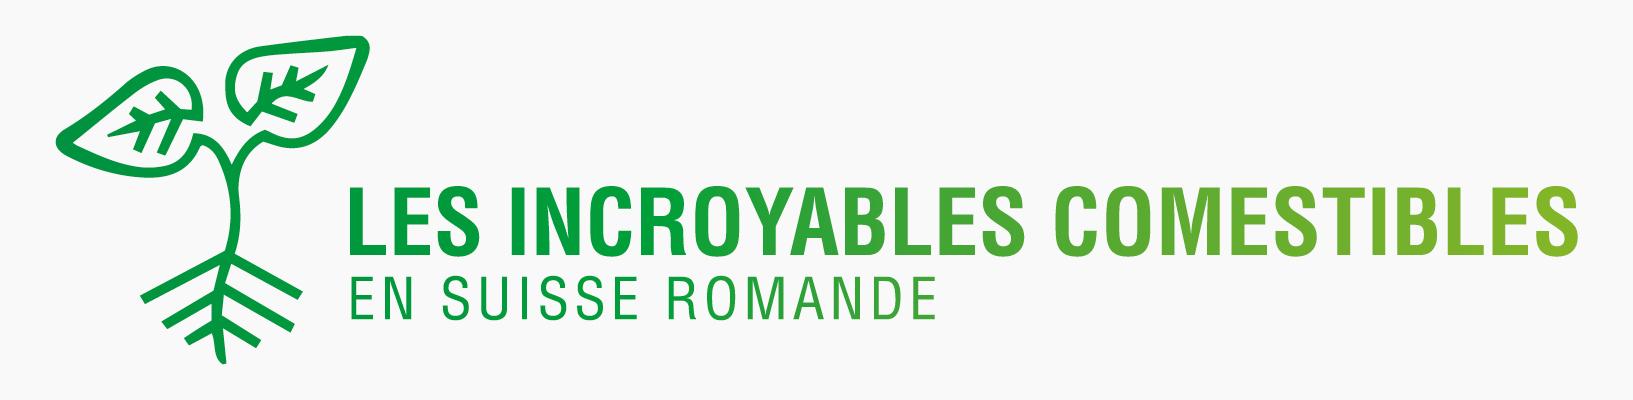 Les Incroyables Comestibles.ch